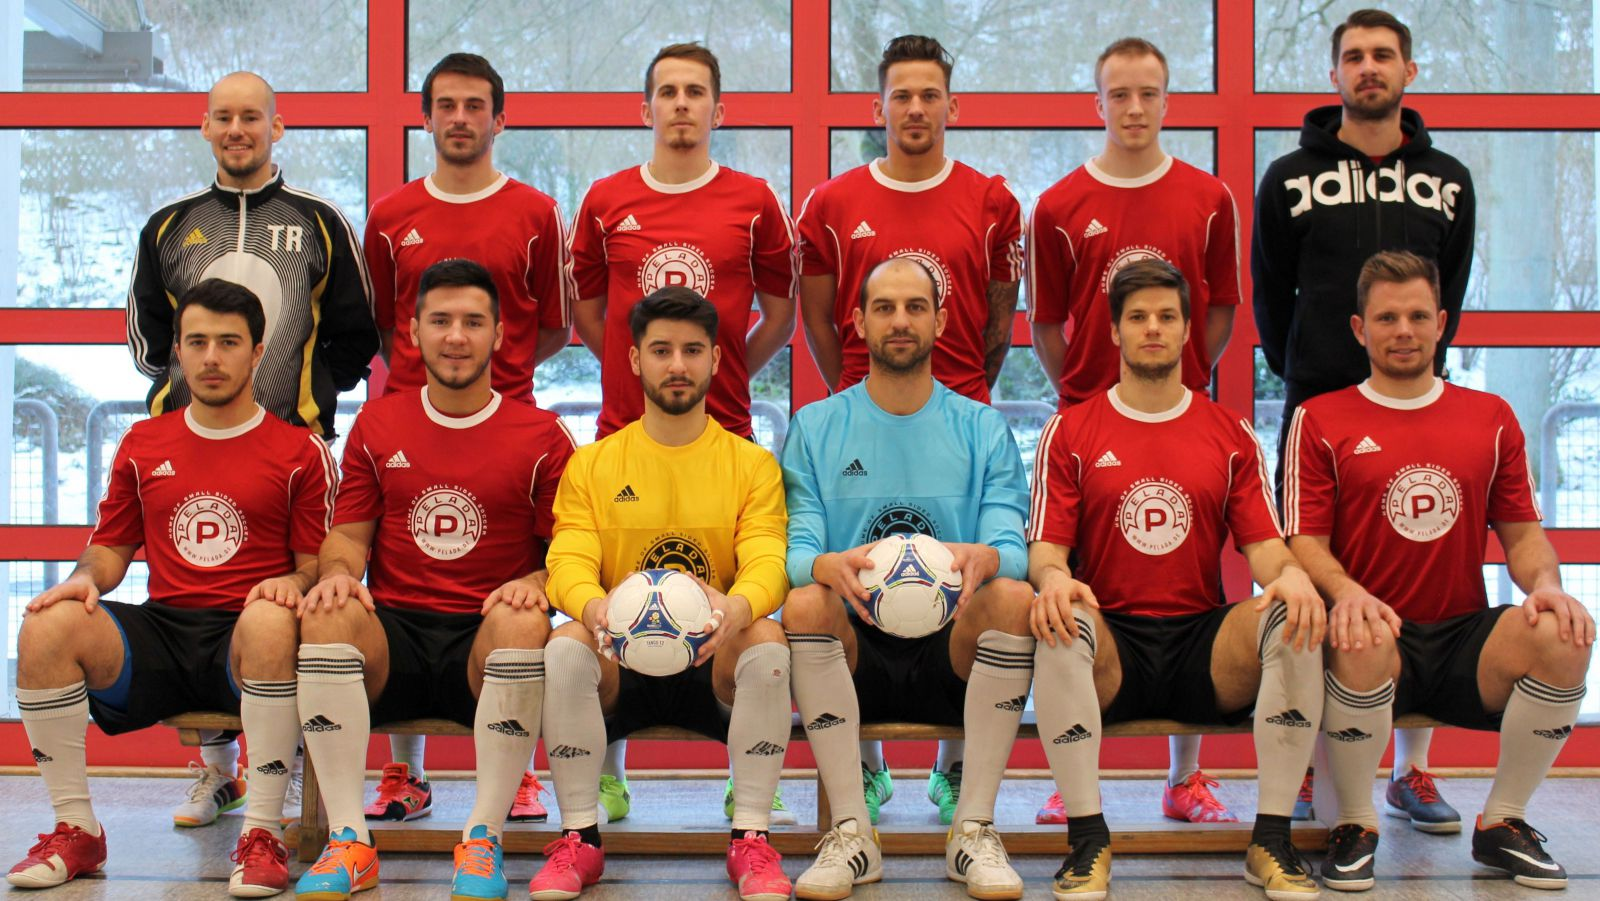 NFV-Futsalauswahl